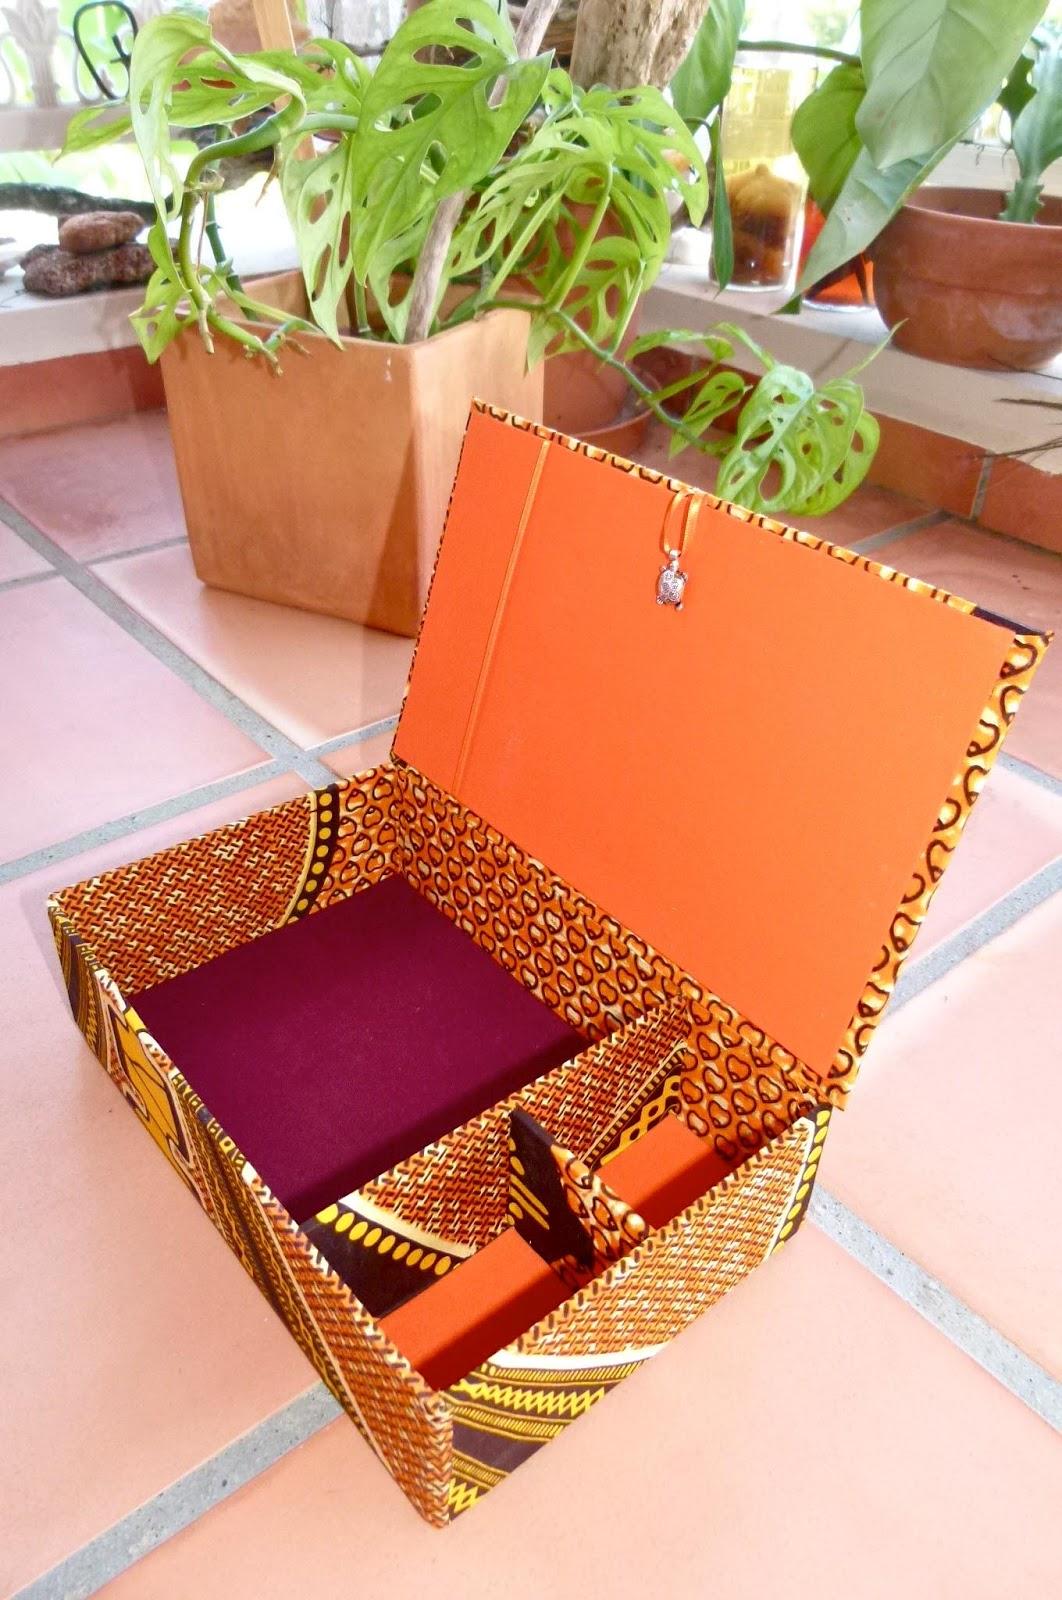 mimi glutte la p 39 tite fabrik tutoriel cartonnage la bo te qui cartonne. Black Bedroom Furniture Sets. Home Design Ideas